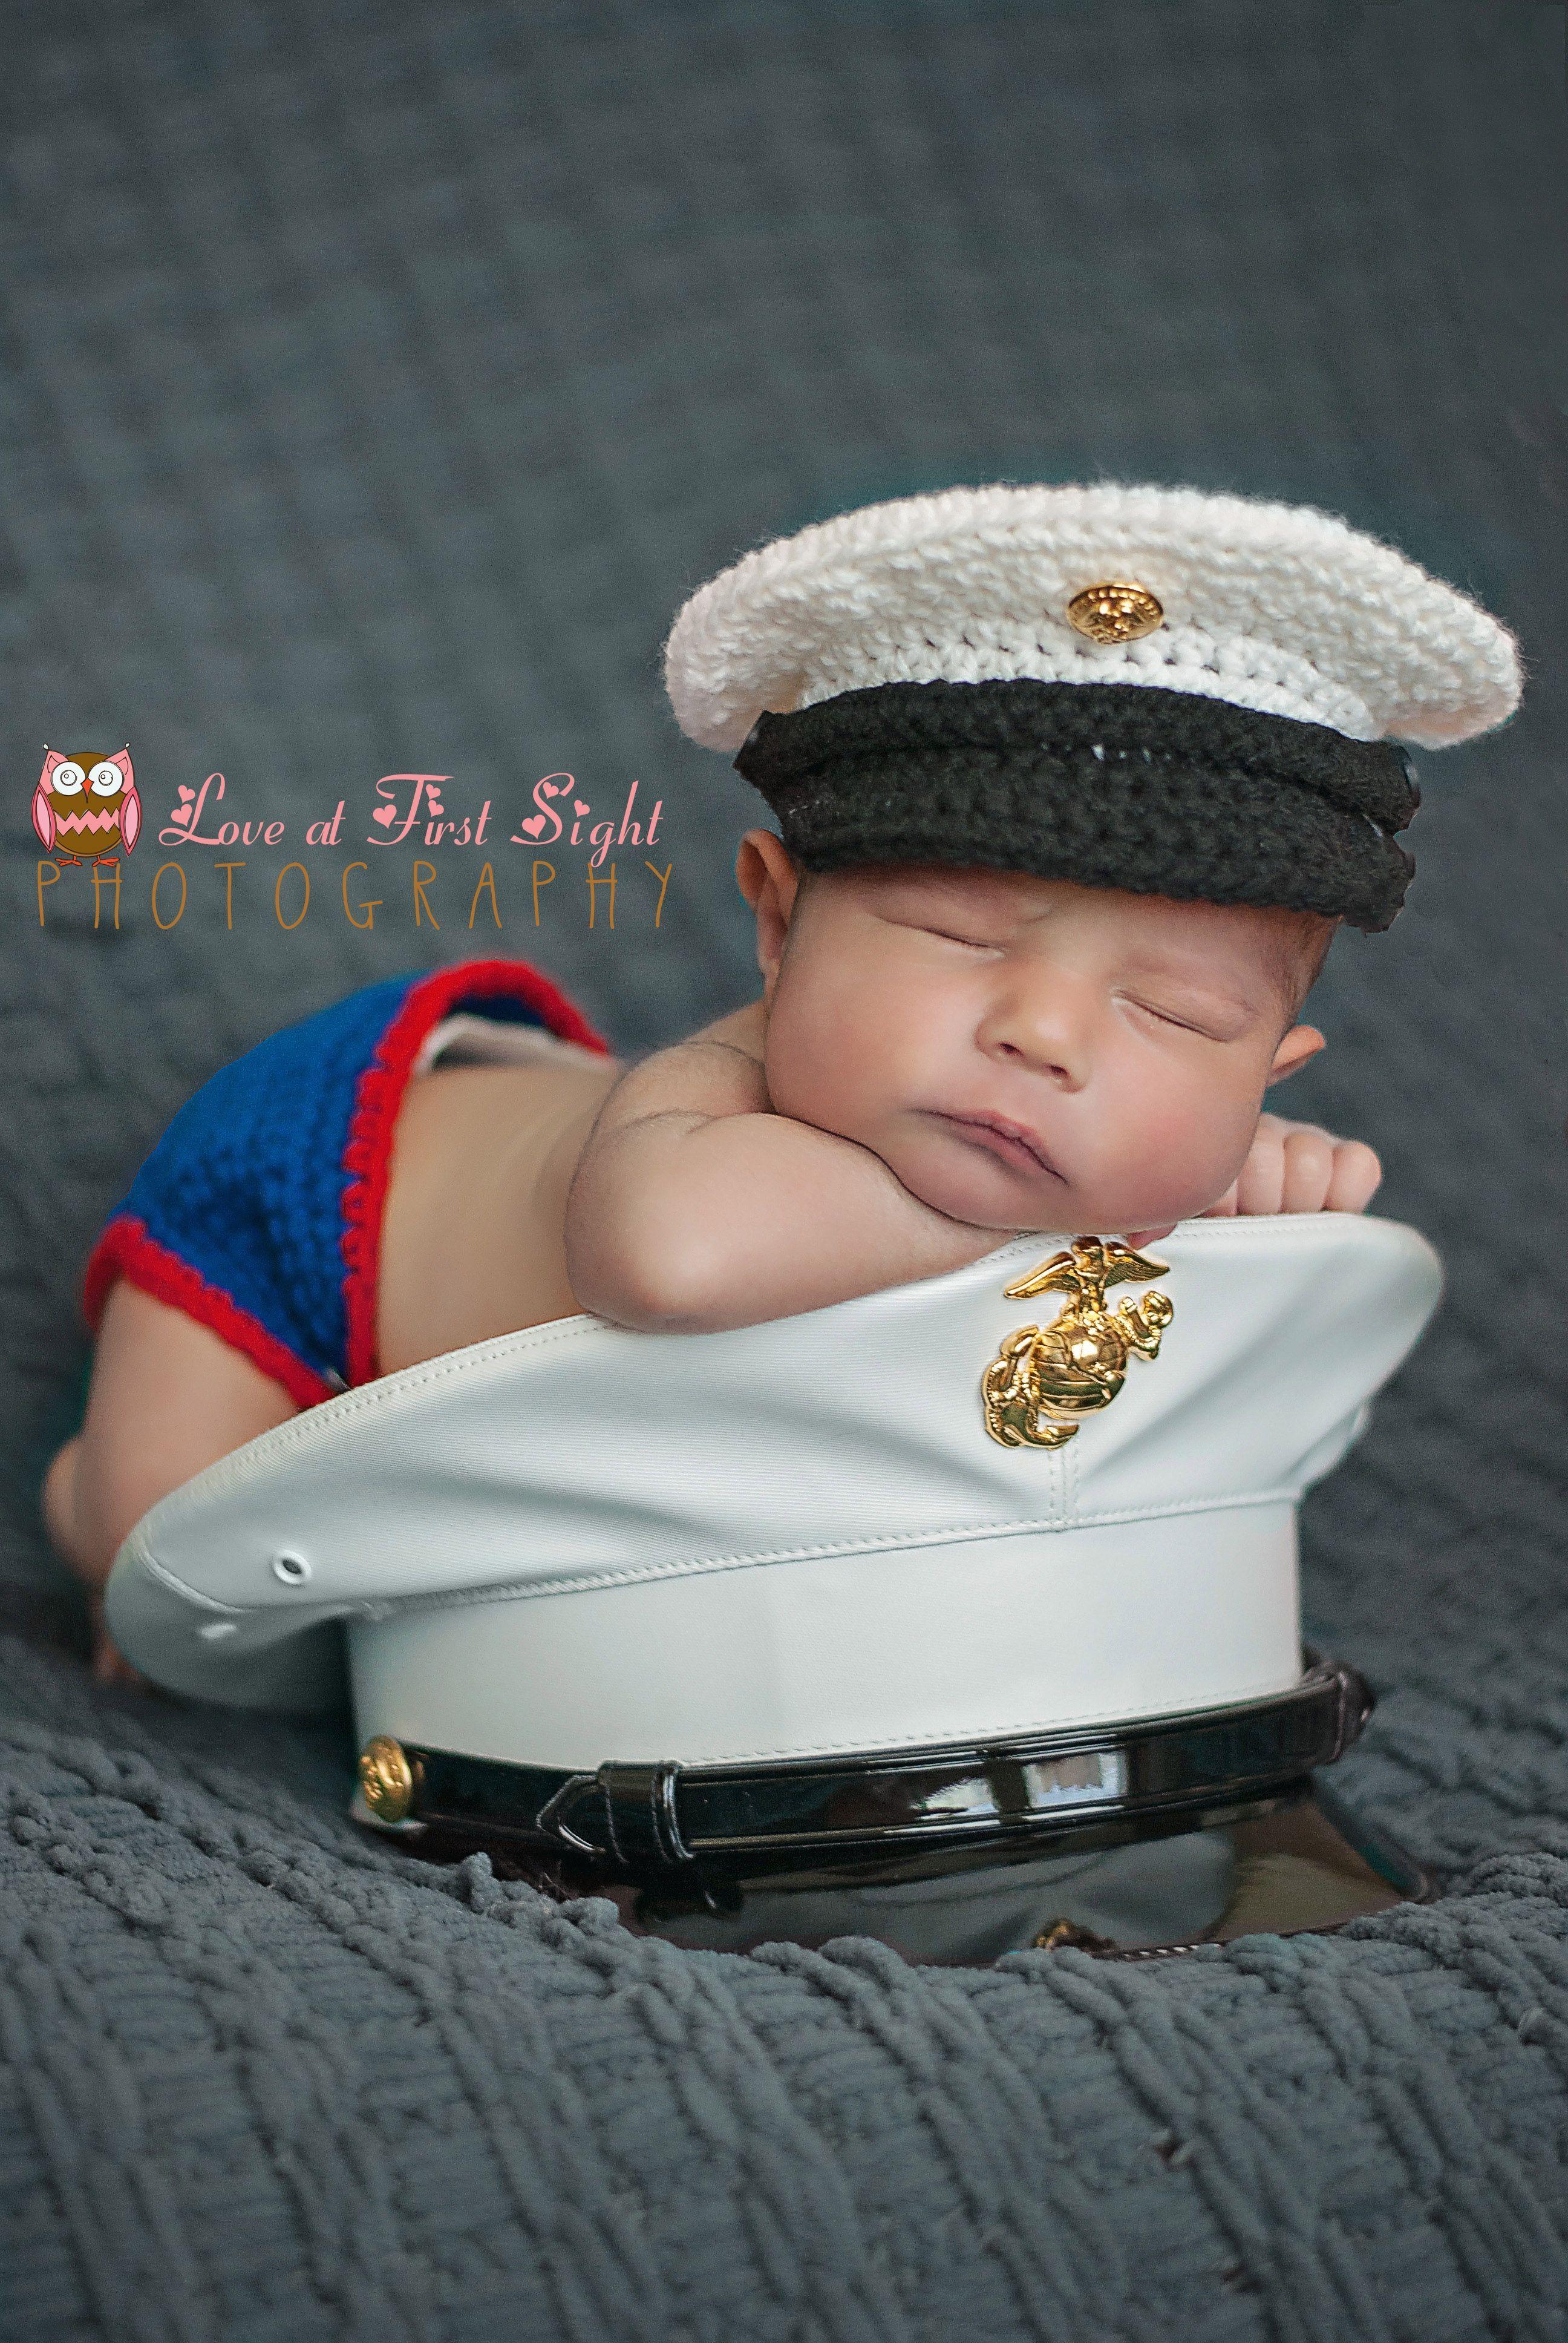 USMC dress blues Newborn Photography #marines #usmc #baby | USMC